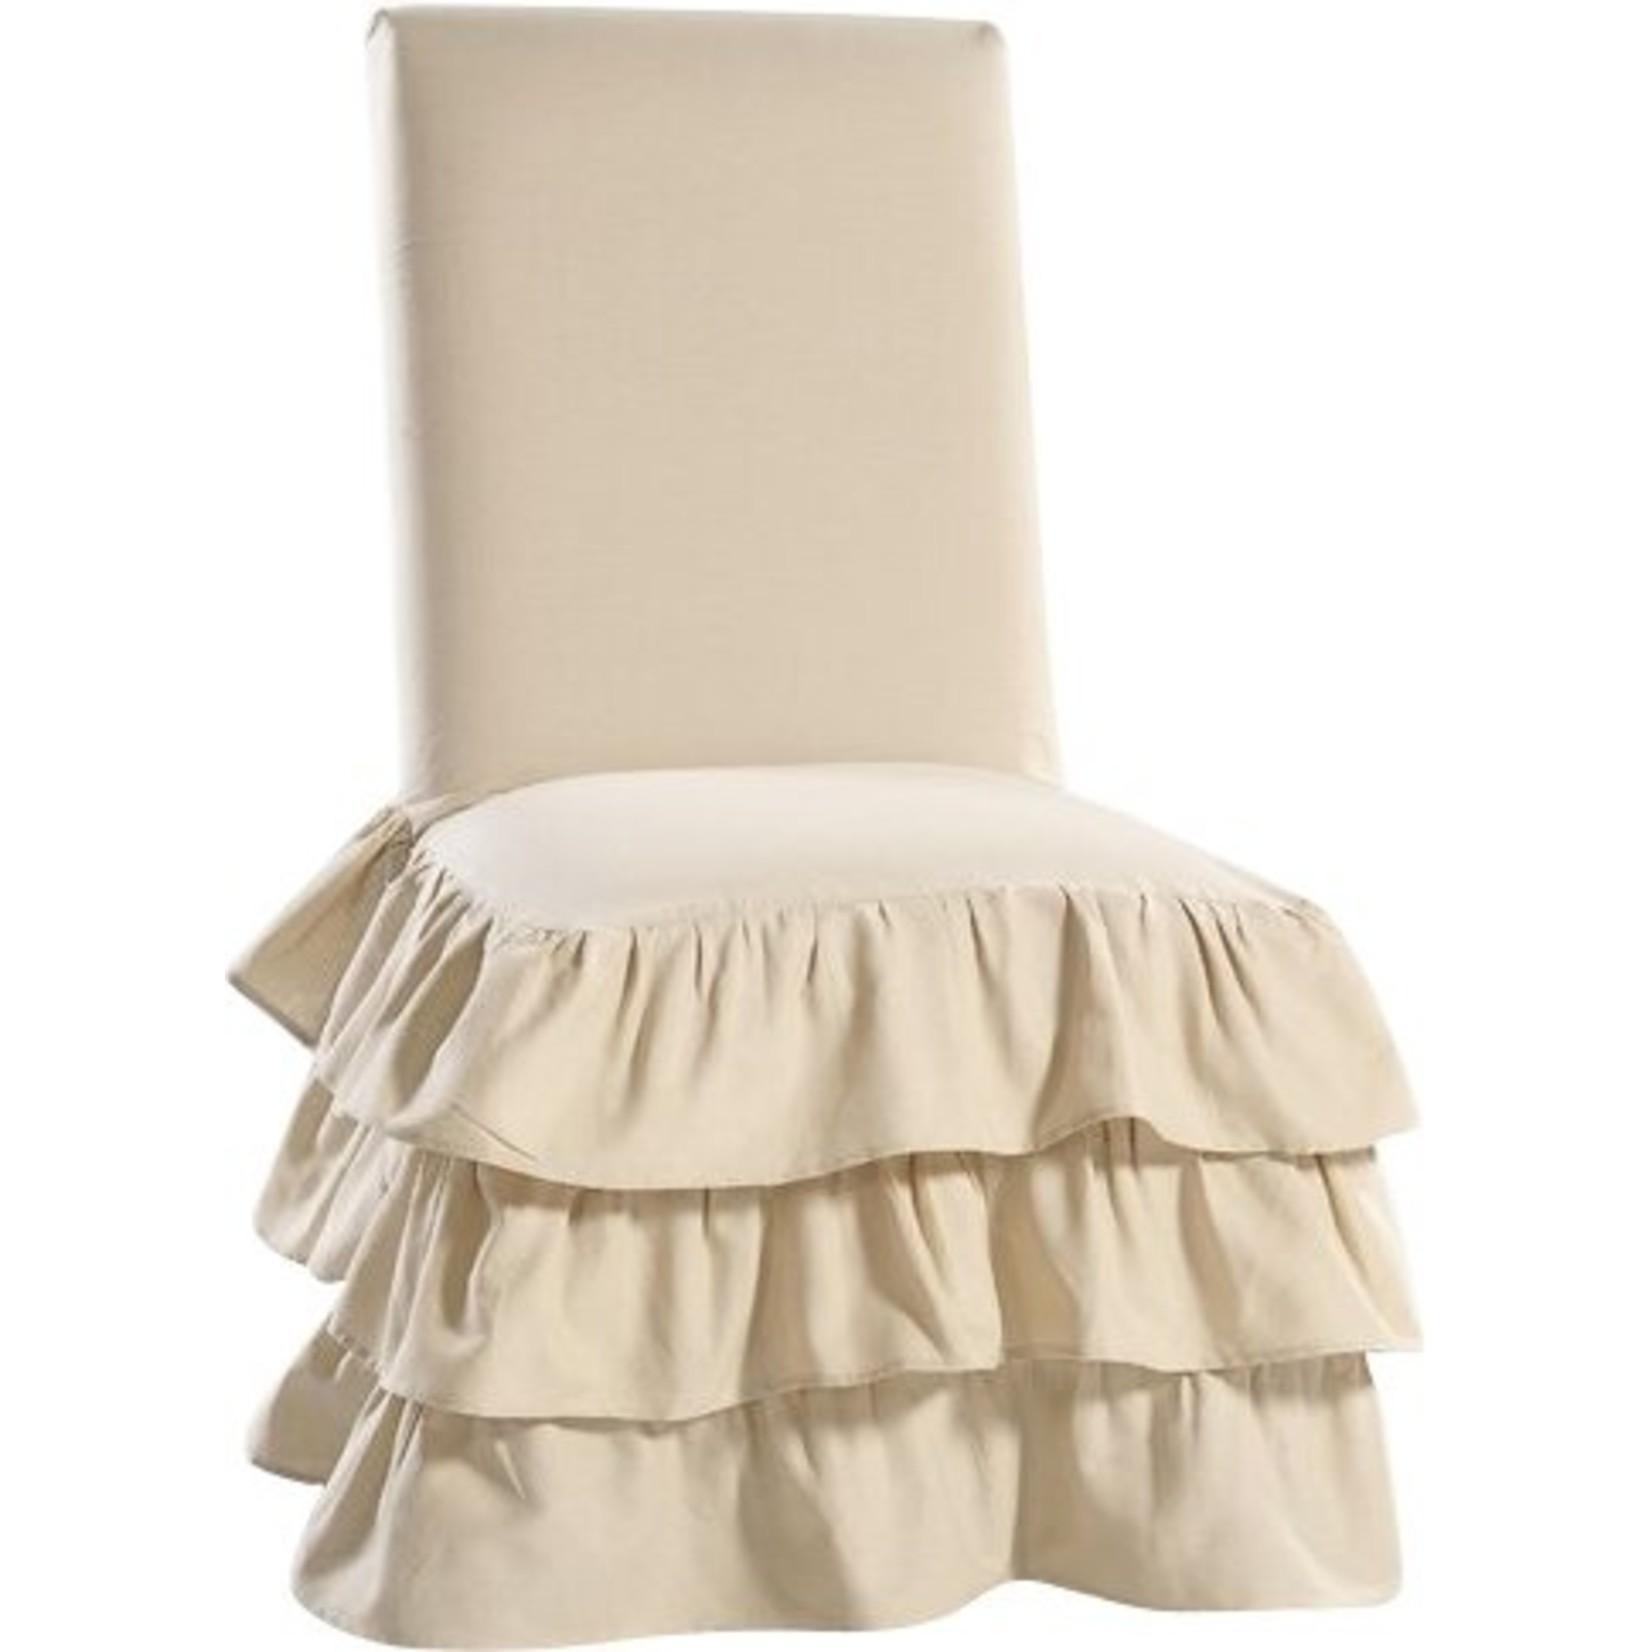 *Parson Skirted Box Cushion Dining Chair Slipcover - Khaki - Final Sale